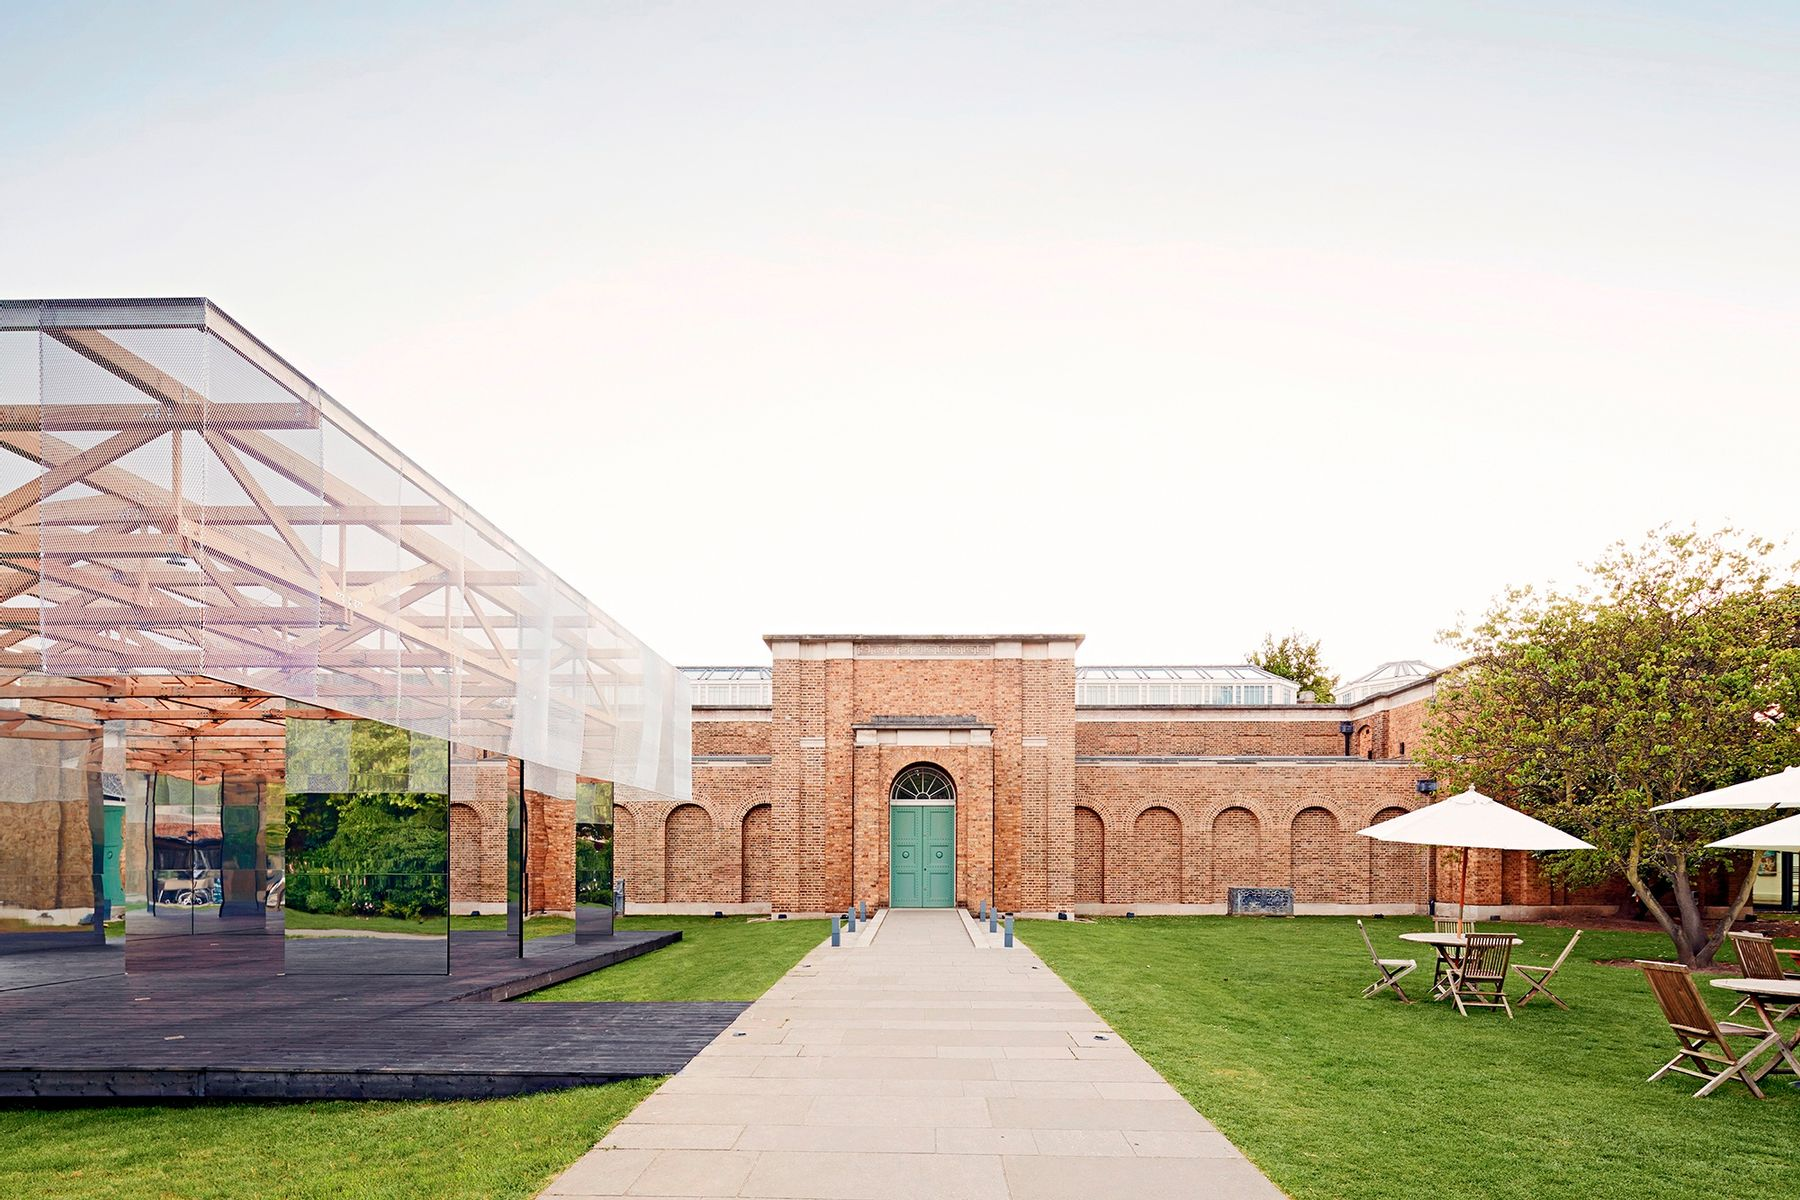 IF_DO's Dulwich Pavilion for the LFA in 2017. Credit: Joakim Borén.